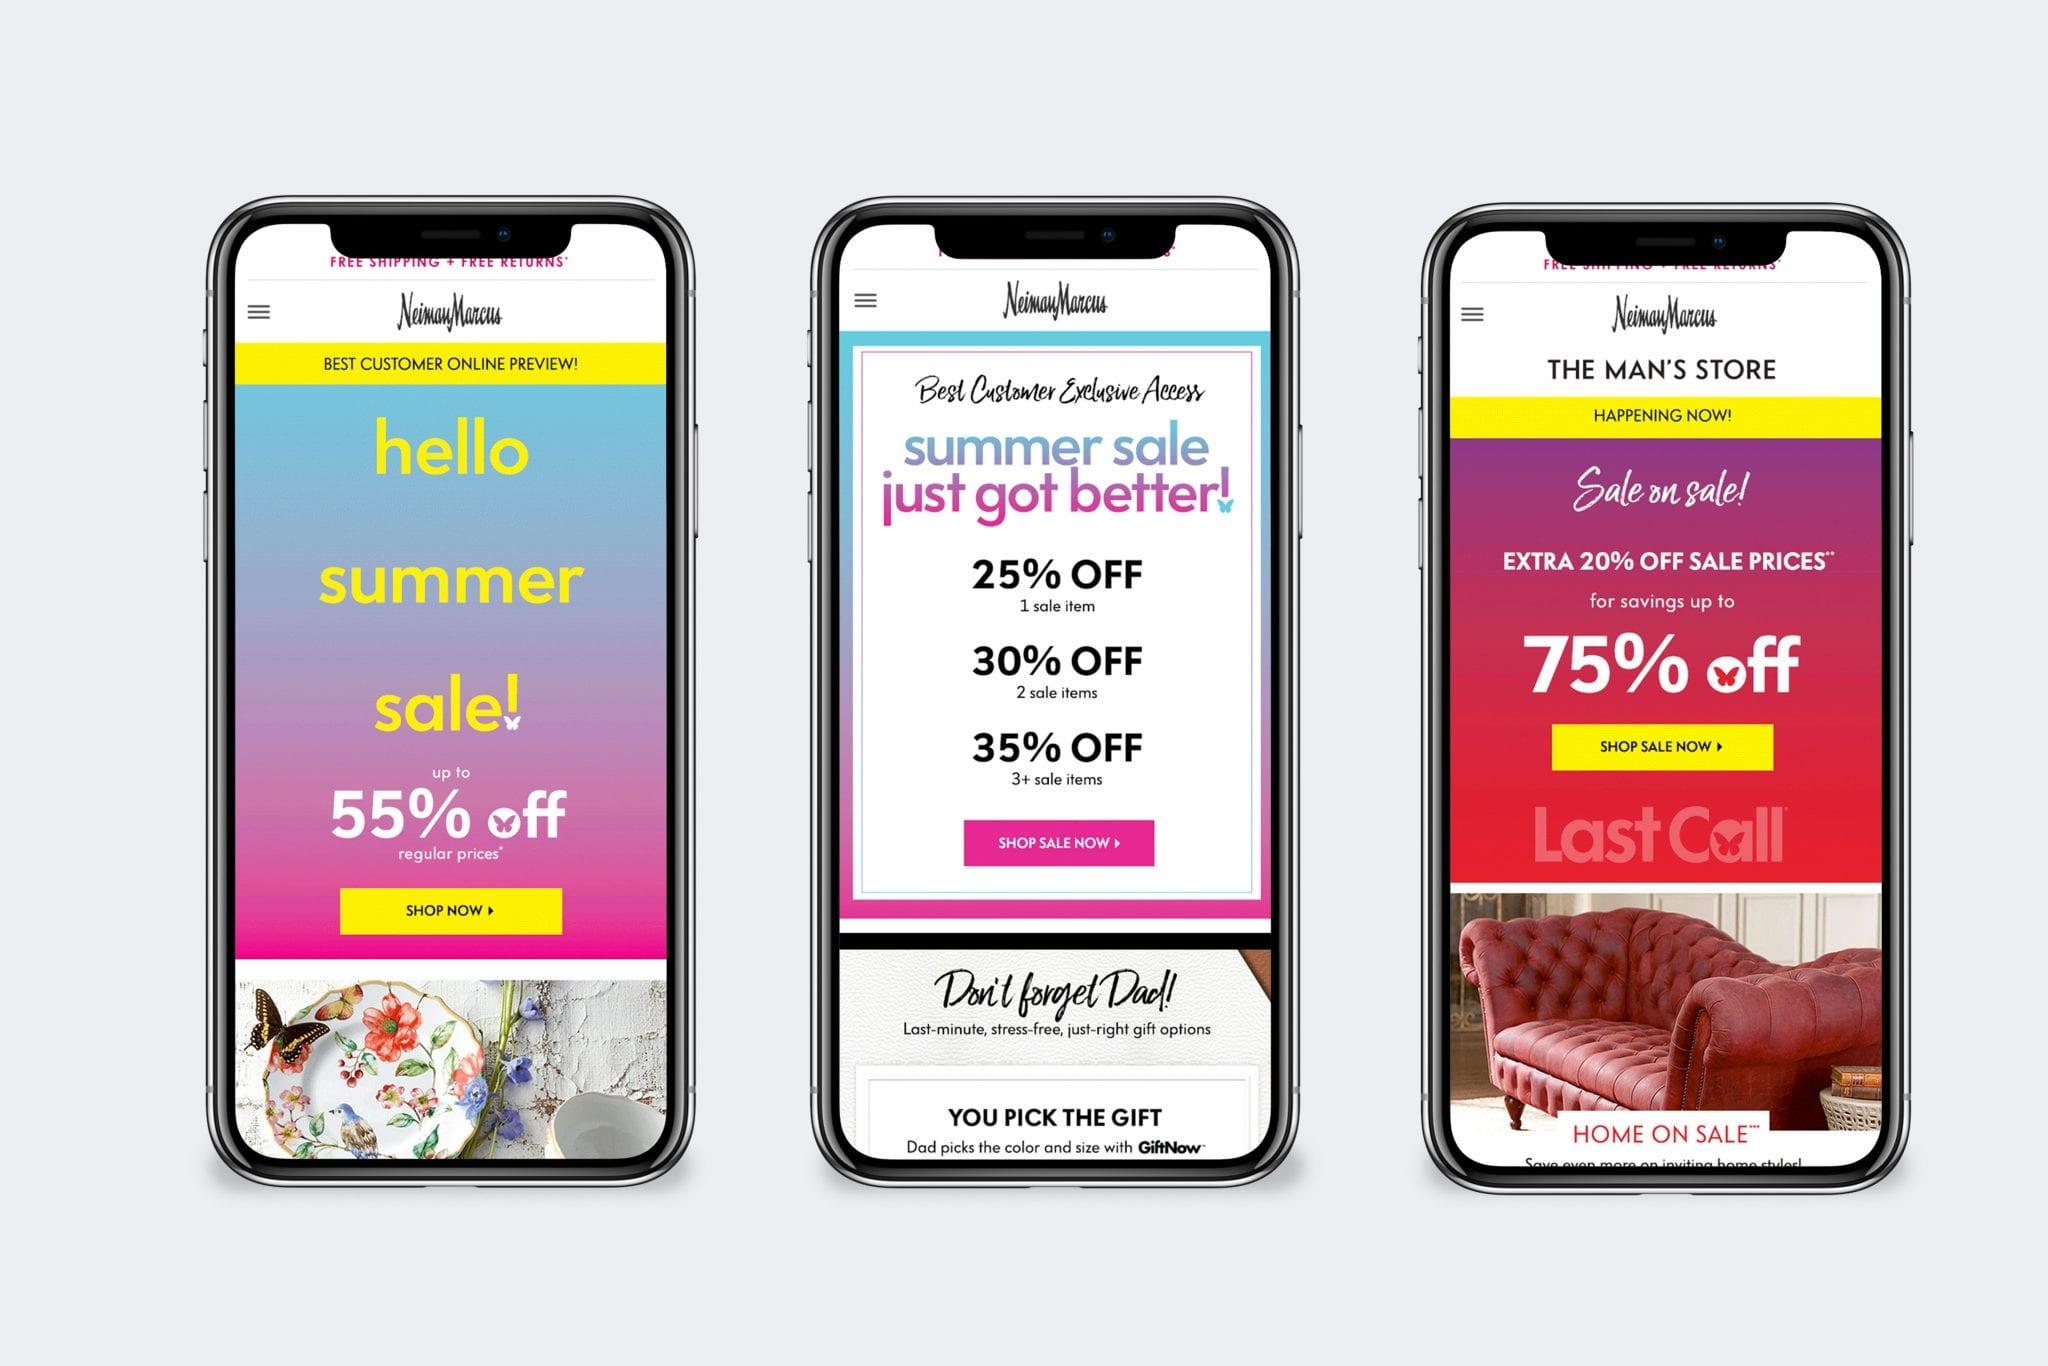 2017 Sale Campaign Image Digital